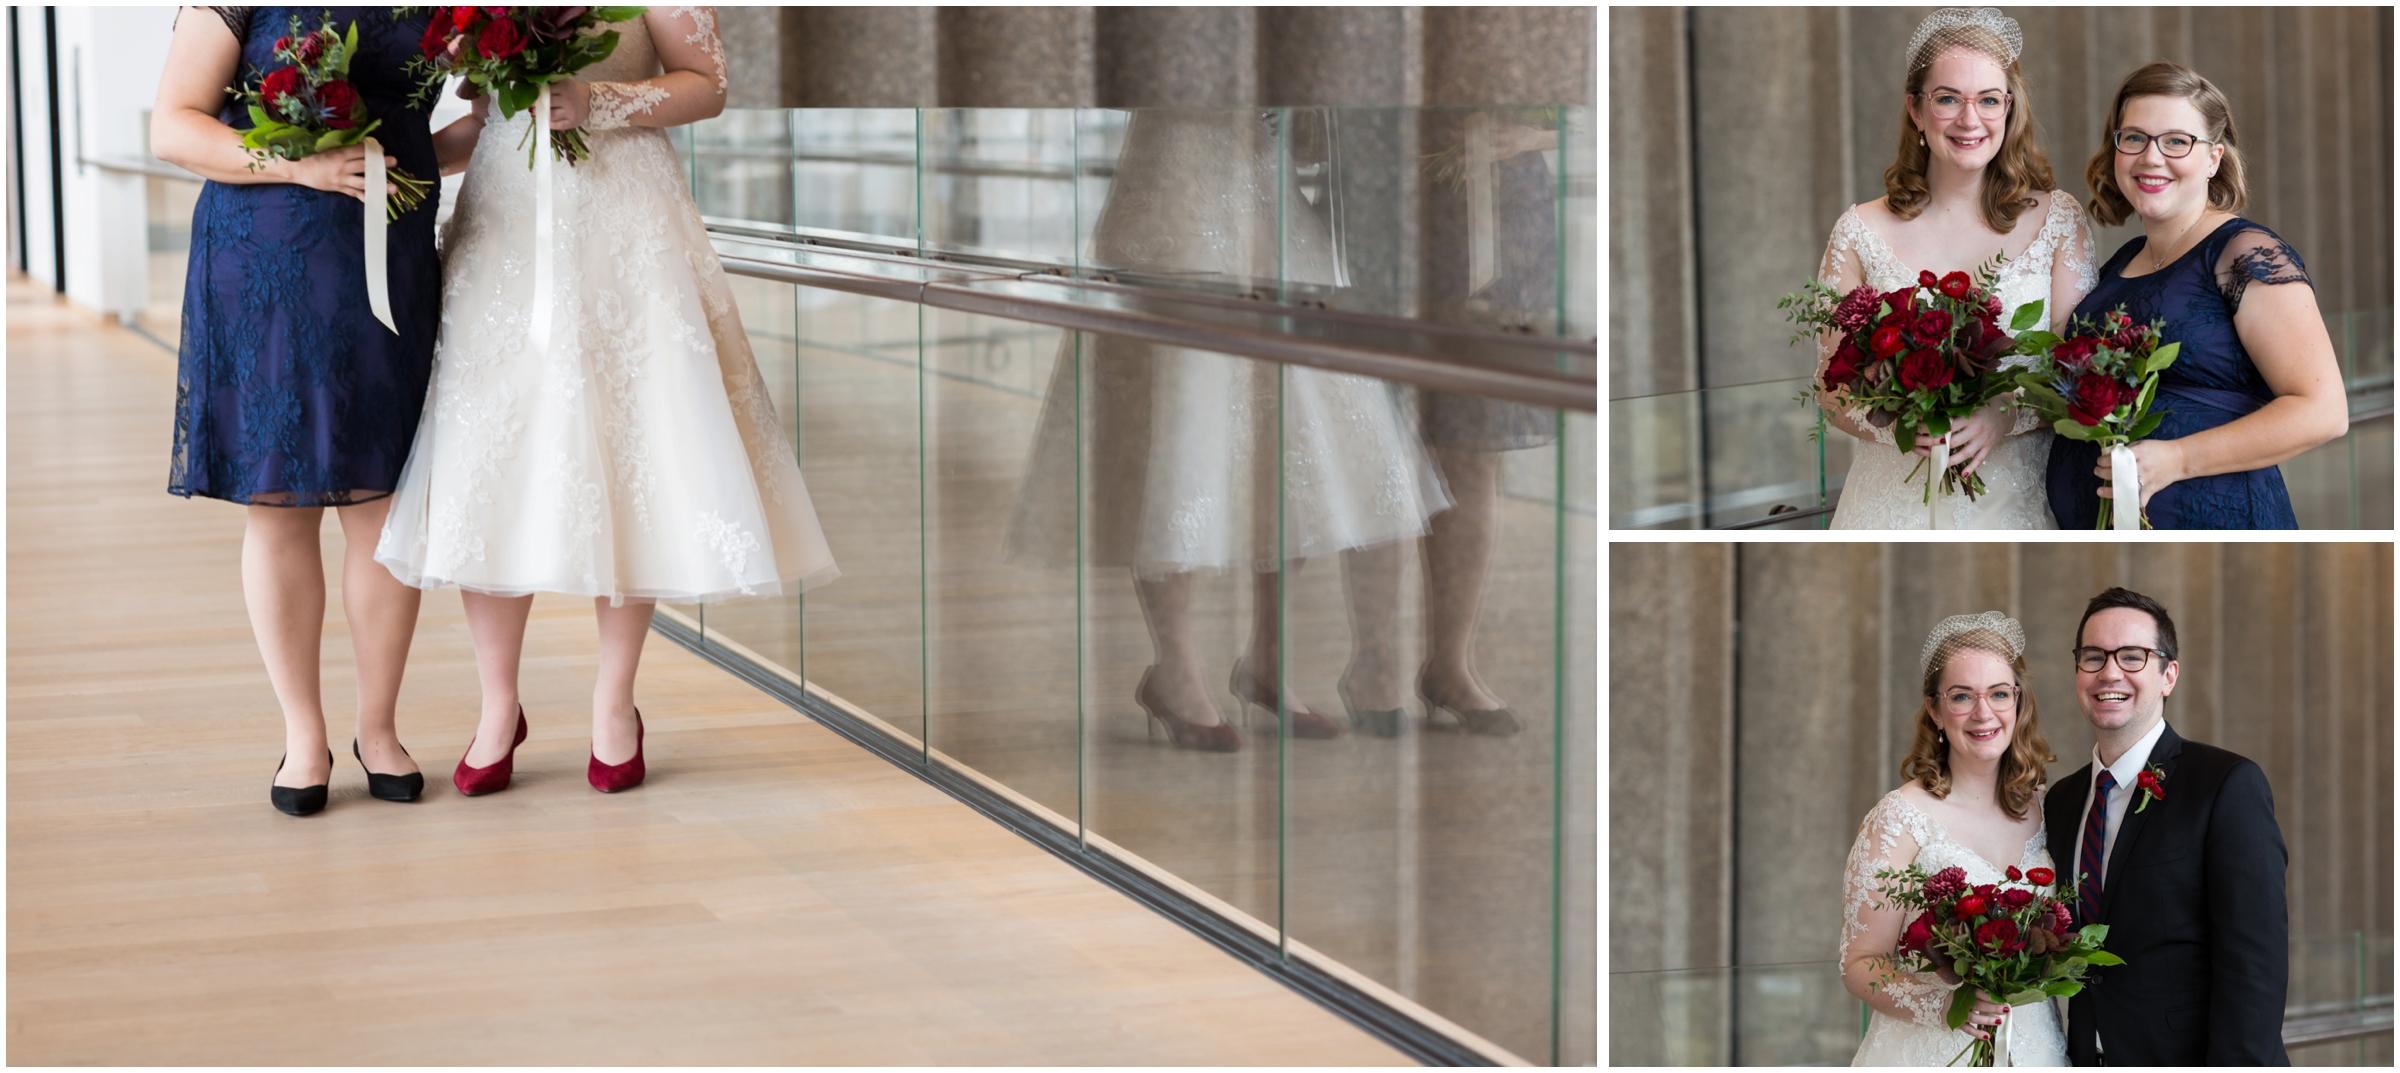 Ottaw Wedding Allison Andrew - (Selena Phillips-Boyle)_0044.jpg